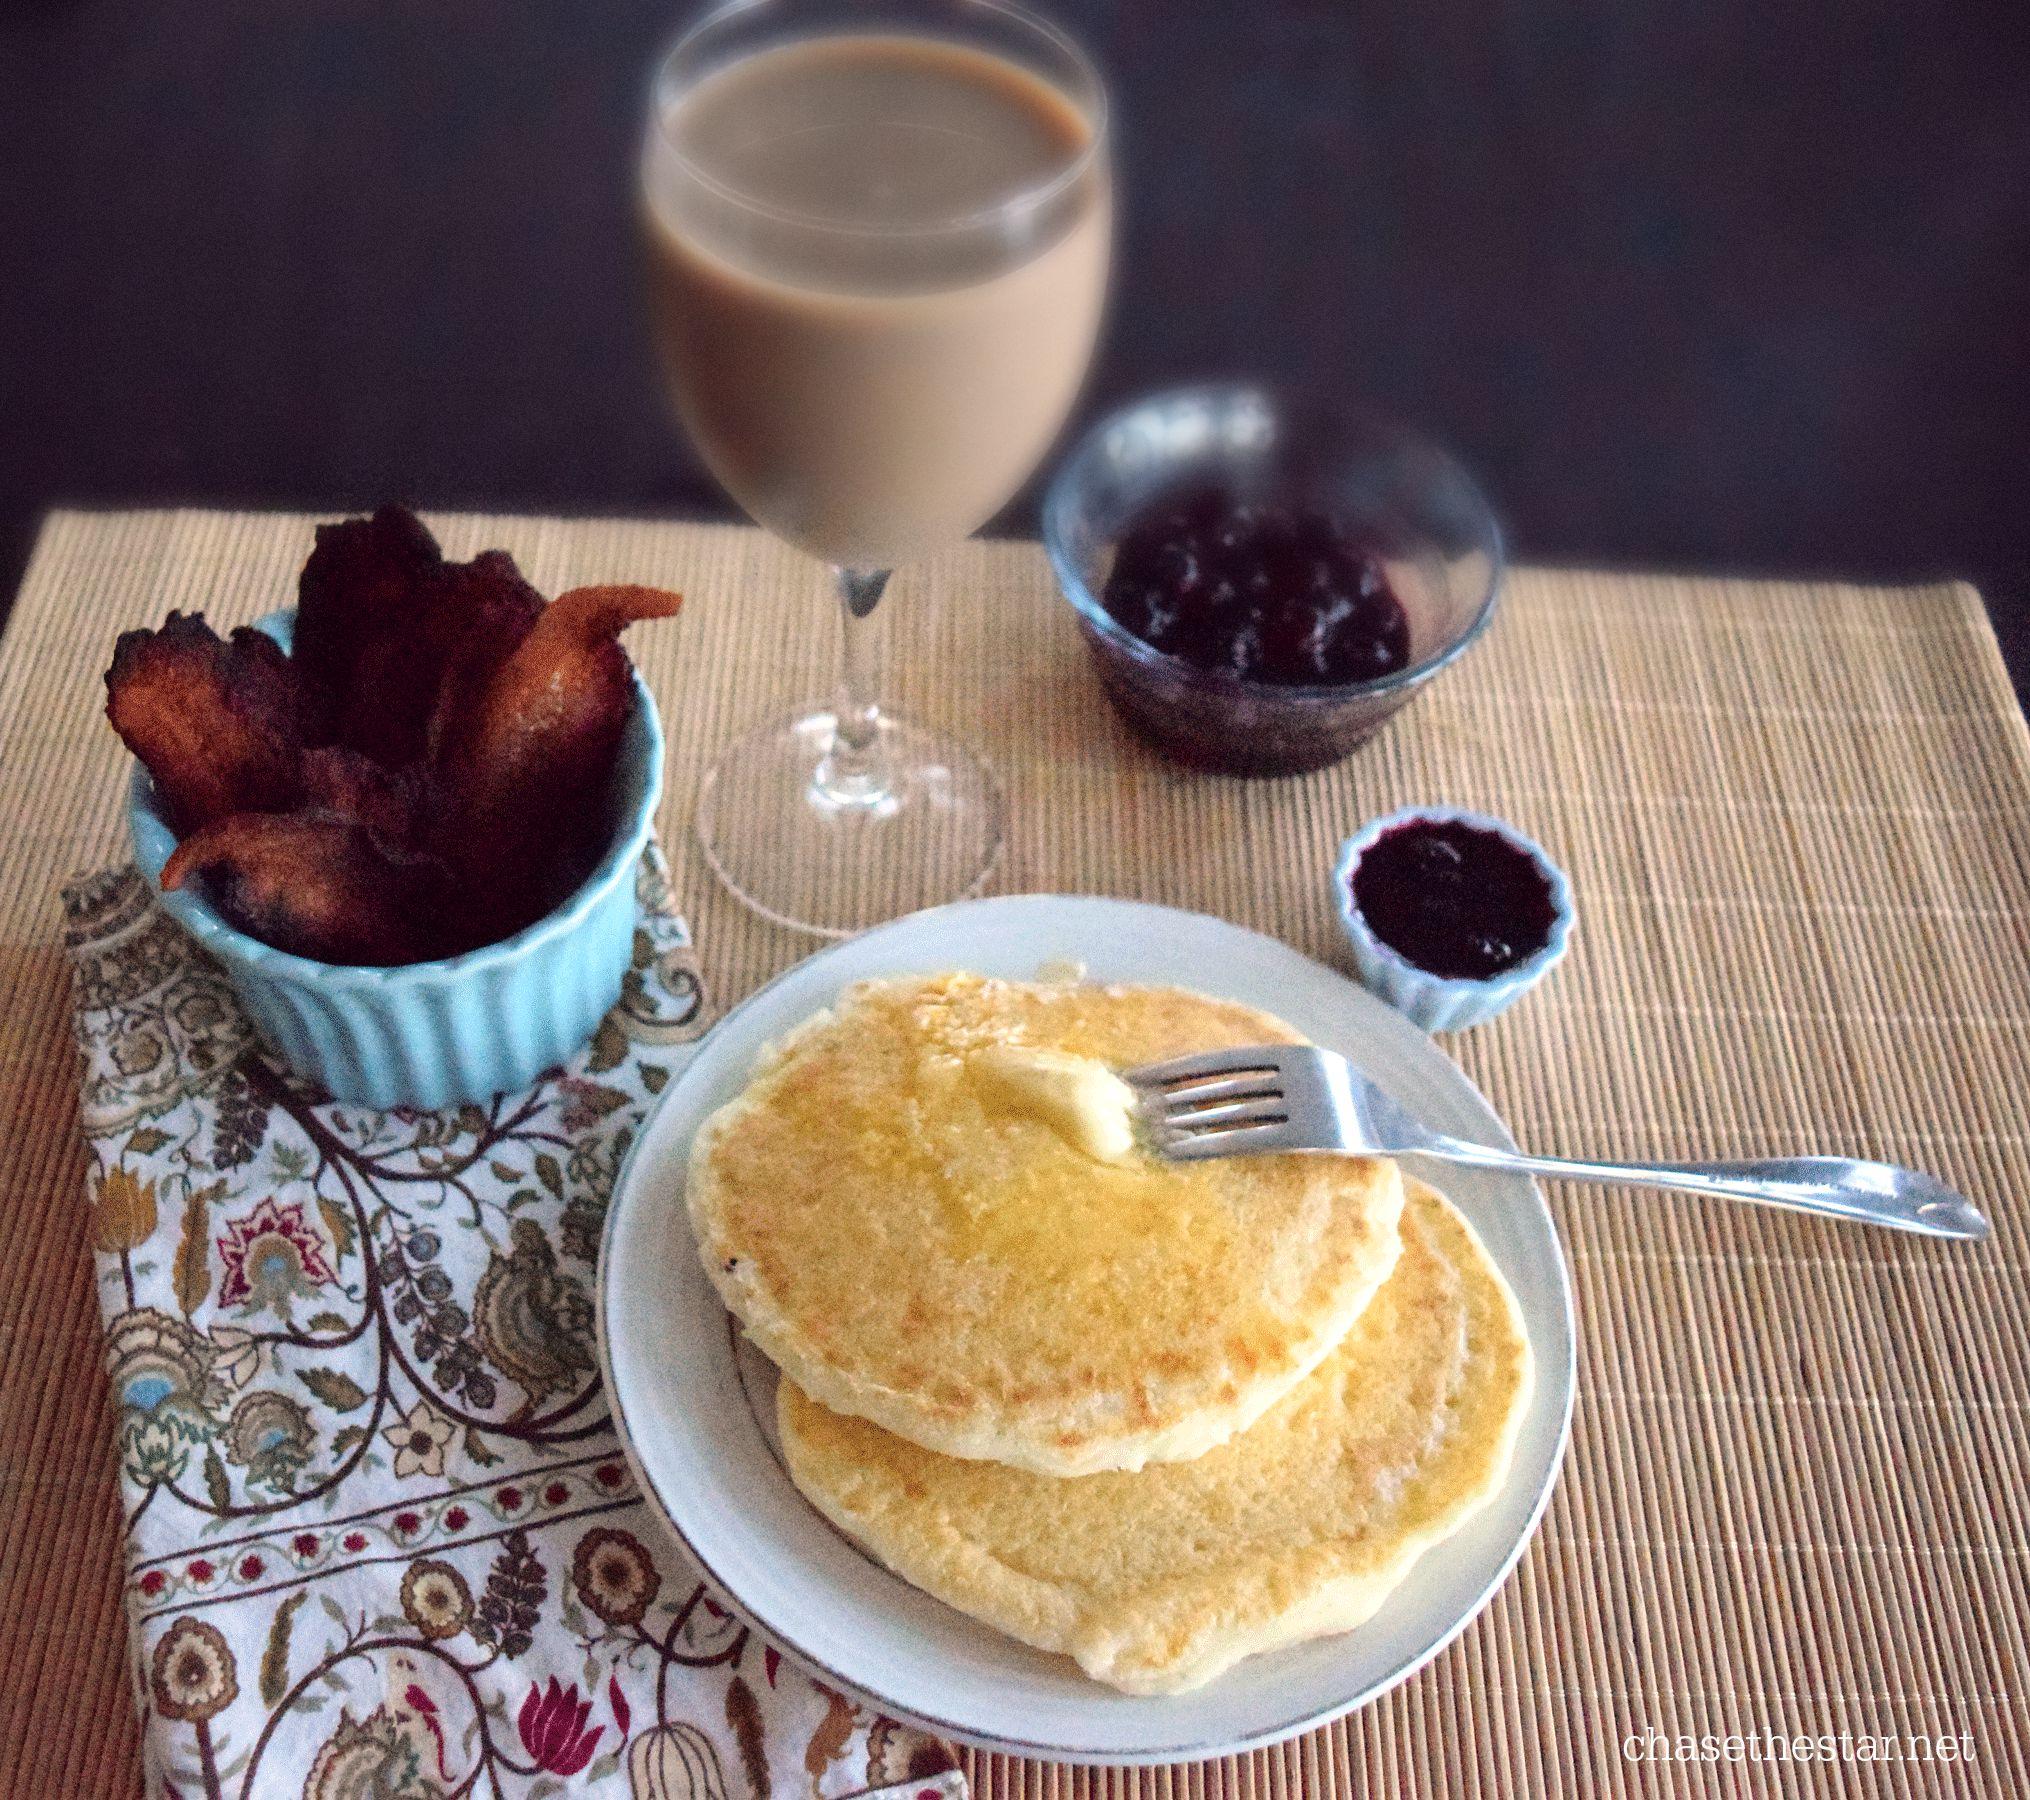 Brunch idea Cornmeal Griddle Cakes #brunch #panfan #IC #ad